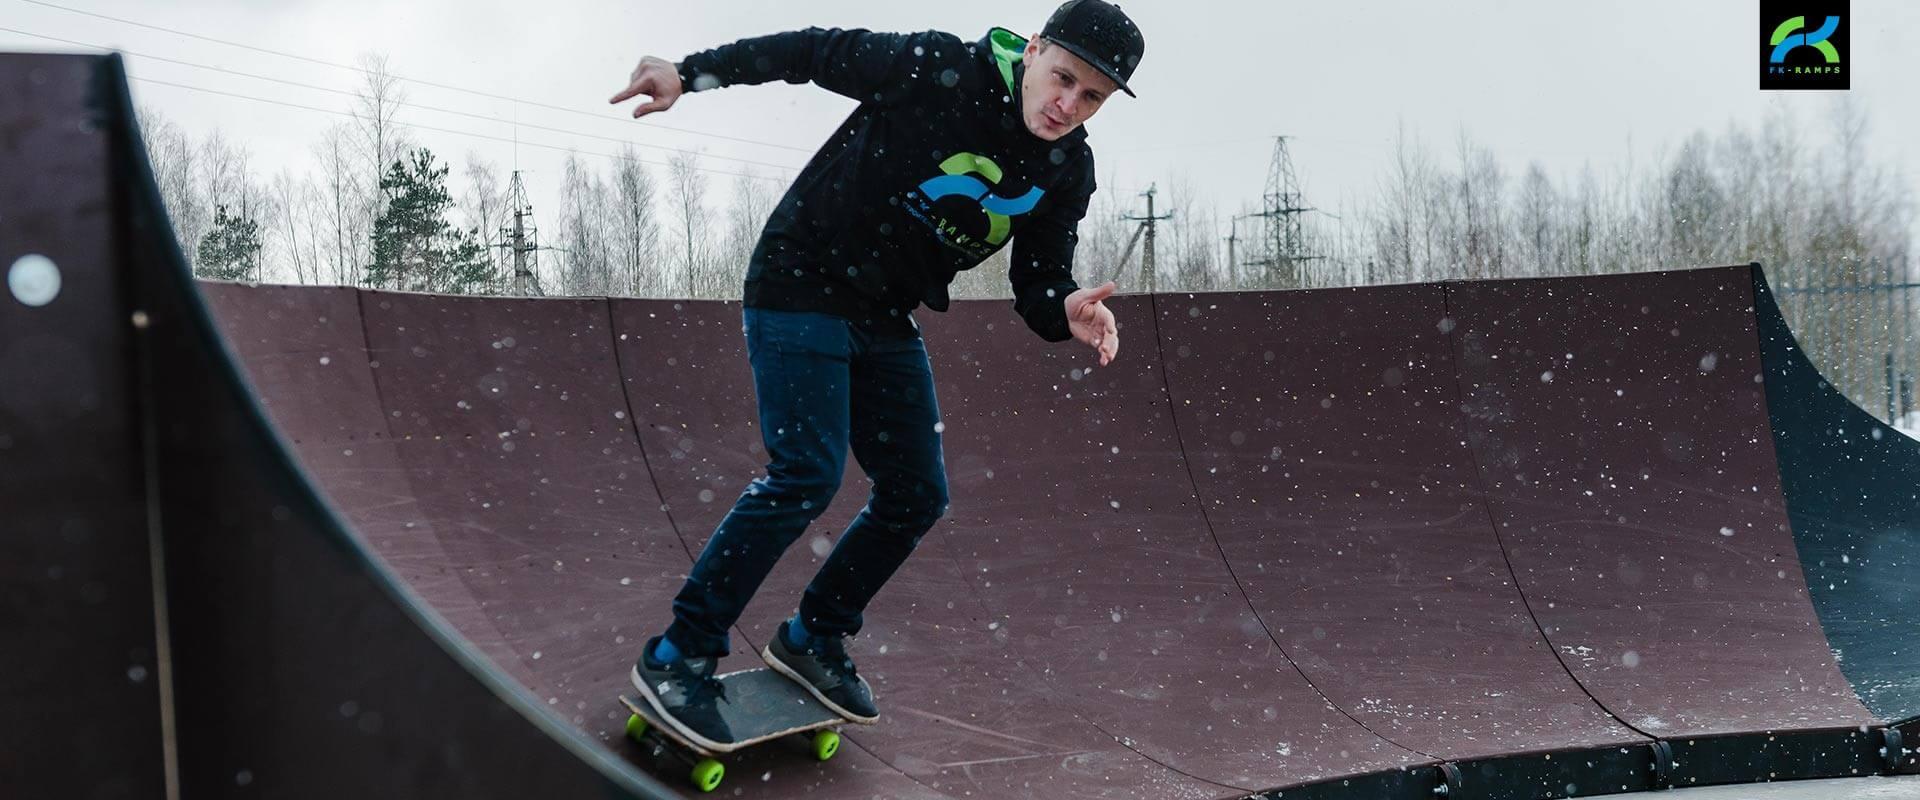 Производим Pump track (памп трек) - FK-ramps